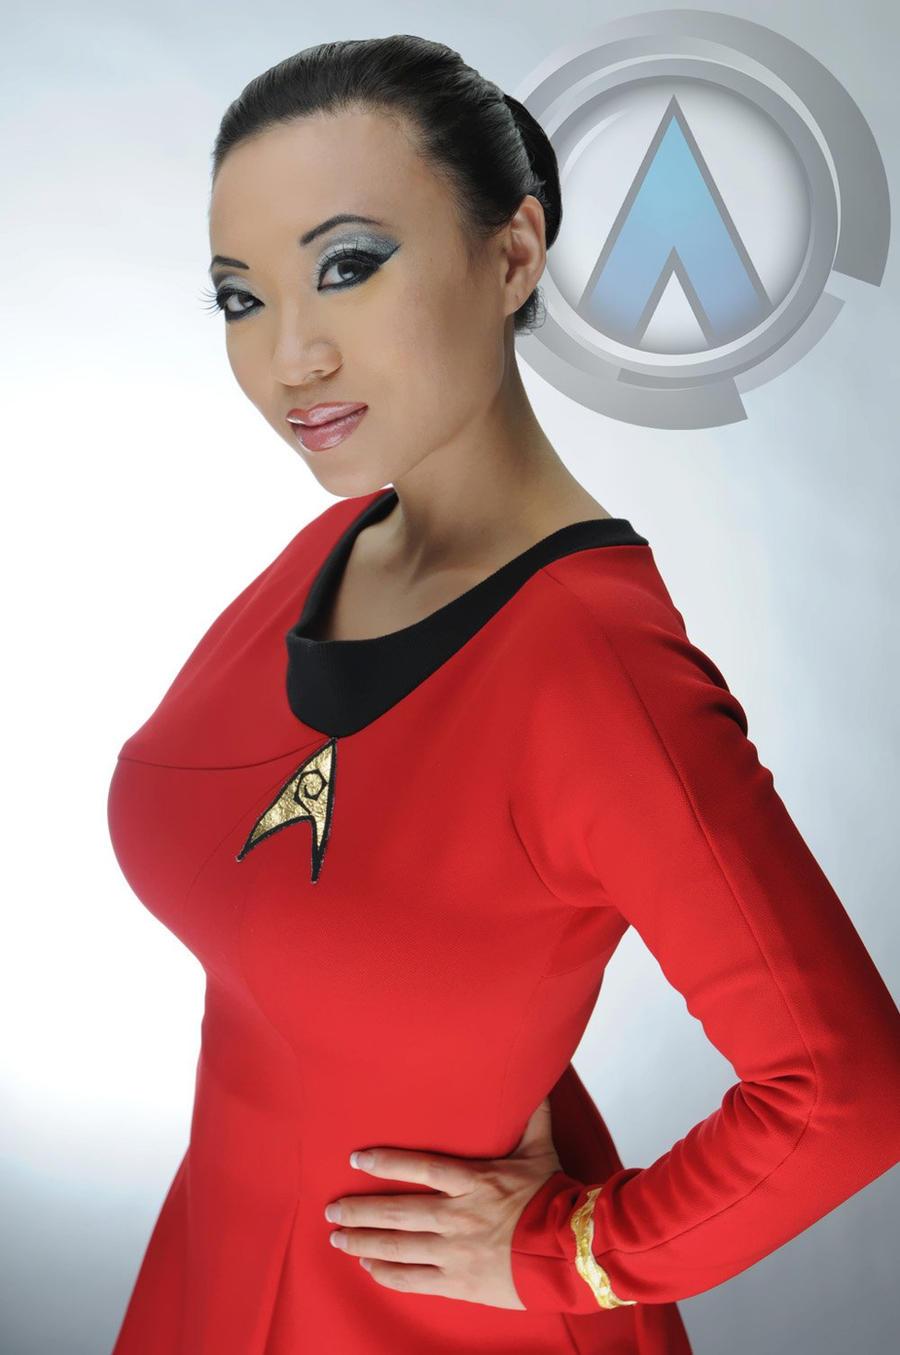 Anovos - Star Trek TOS dress by yayacosplay